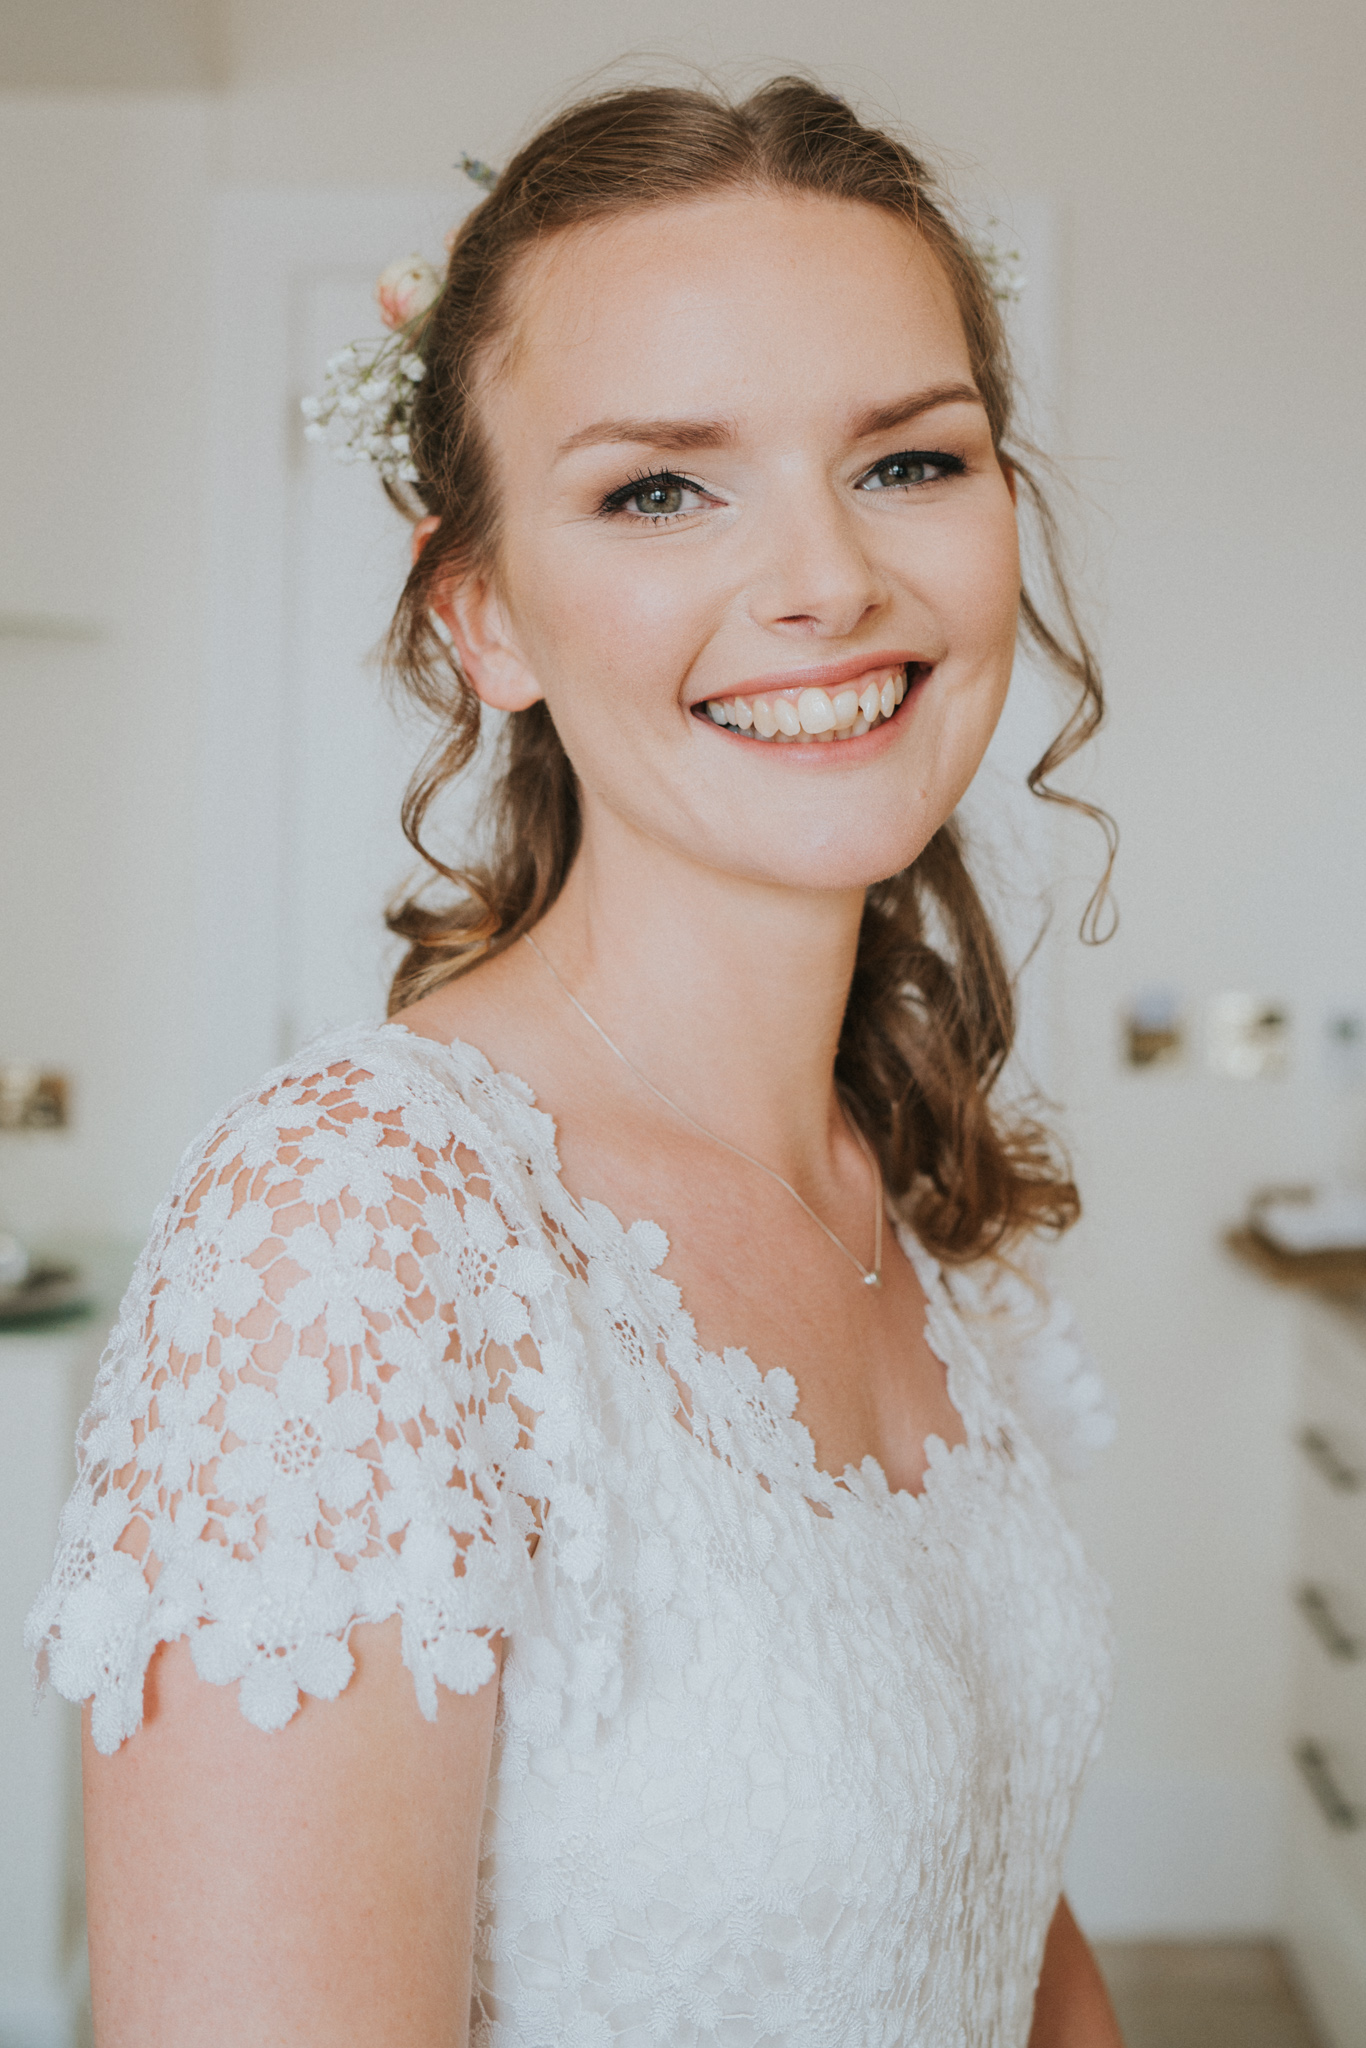 Grace-Elizabeth-Georgie-Amalaketu-Firstsite-Colchester-Essex-Boho-Buddhist-Wedding-Alternative-Wedding-Photography-Essex (30 of 100).jpg